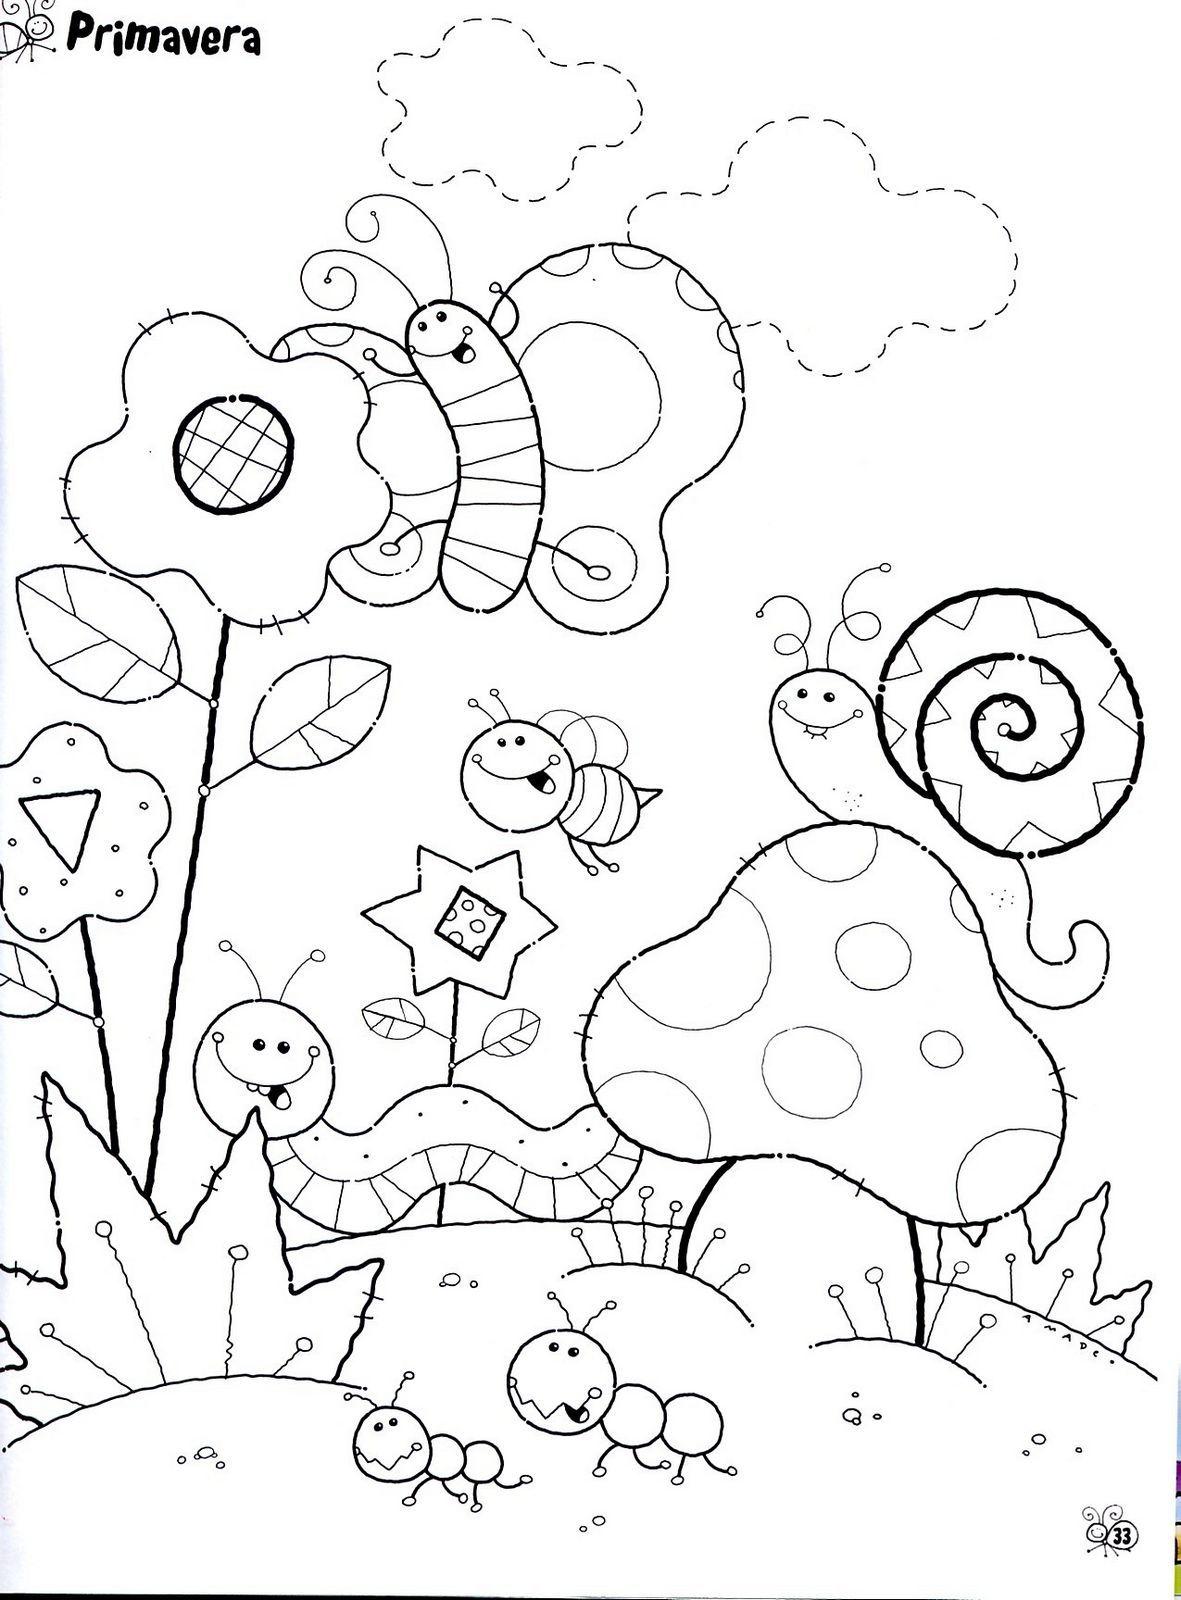 dibujos de primavera para colorear | dibujos | Pinterest | Dibujos ...